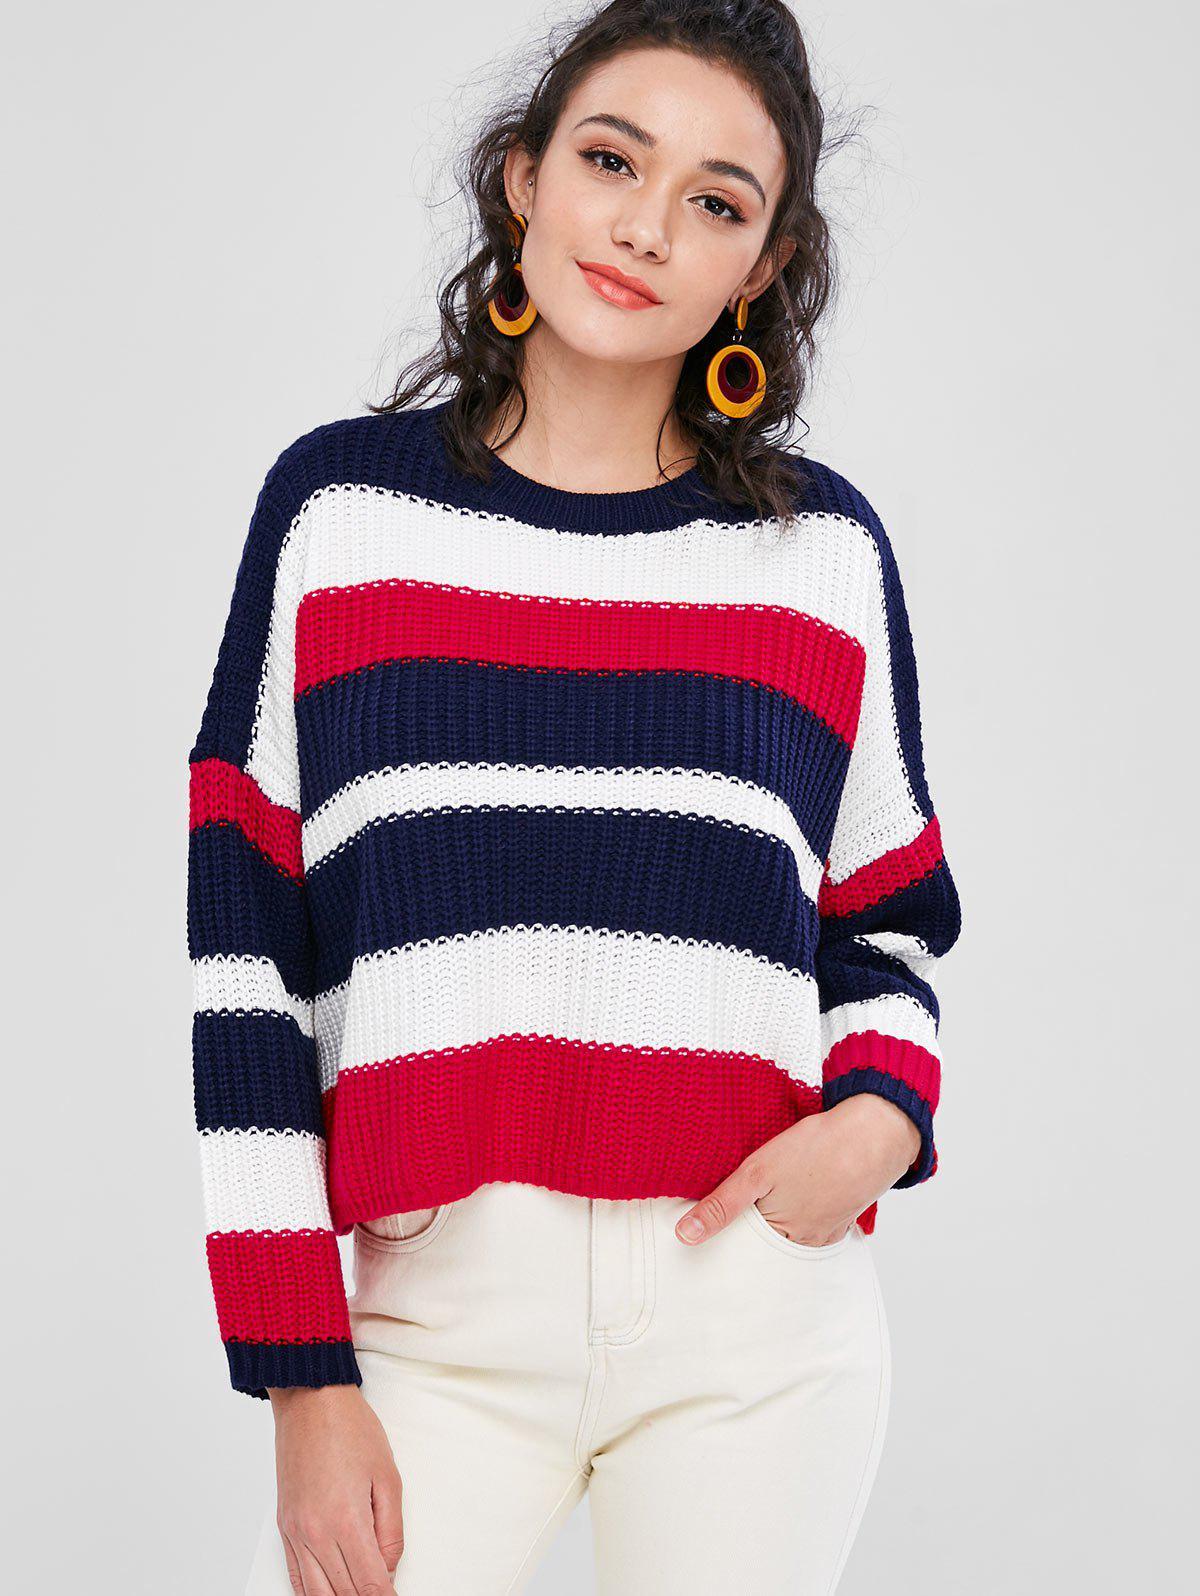 Striped Chunky Boxy Oversized Sweater